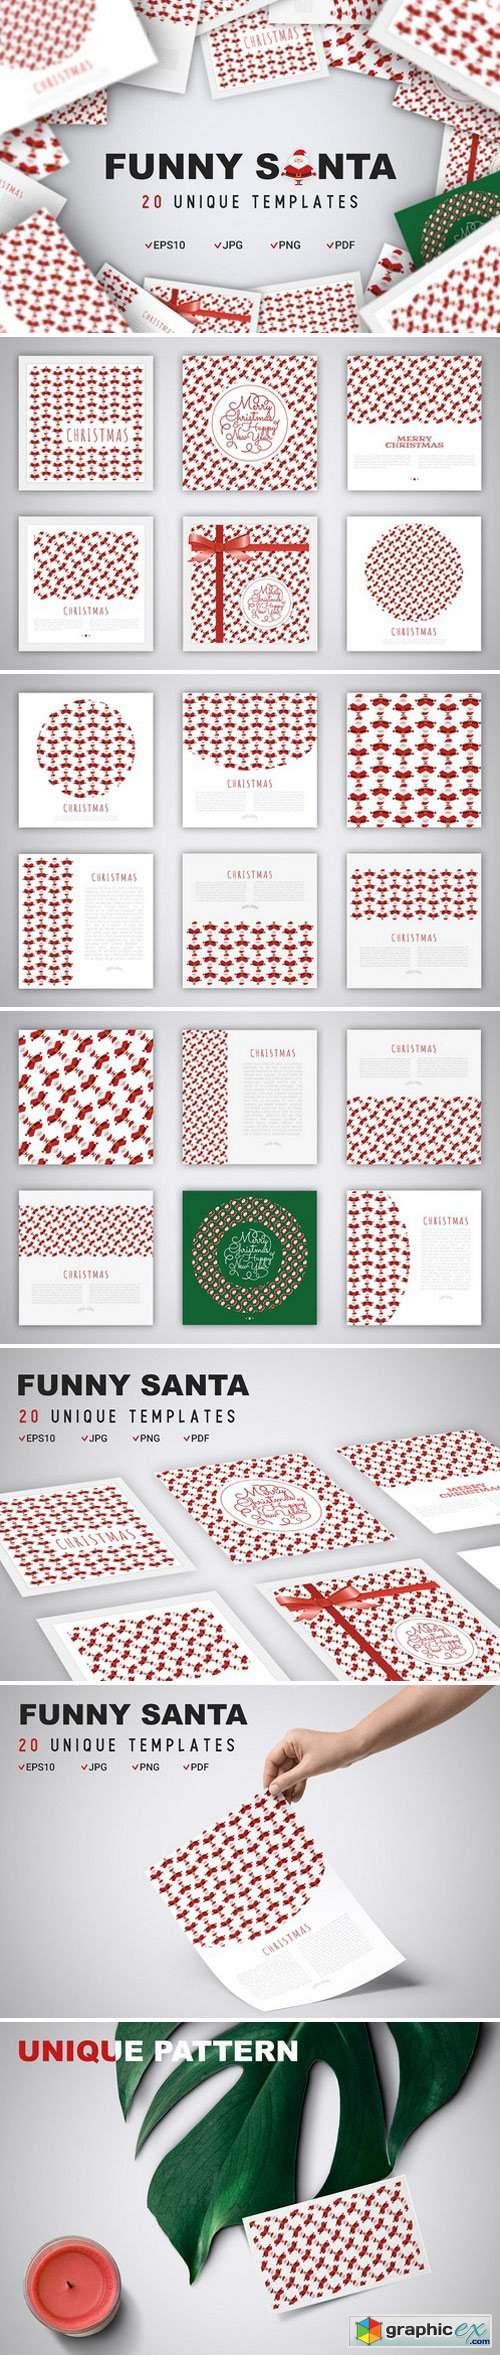 Funny Santa Concept